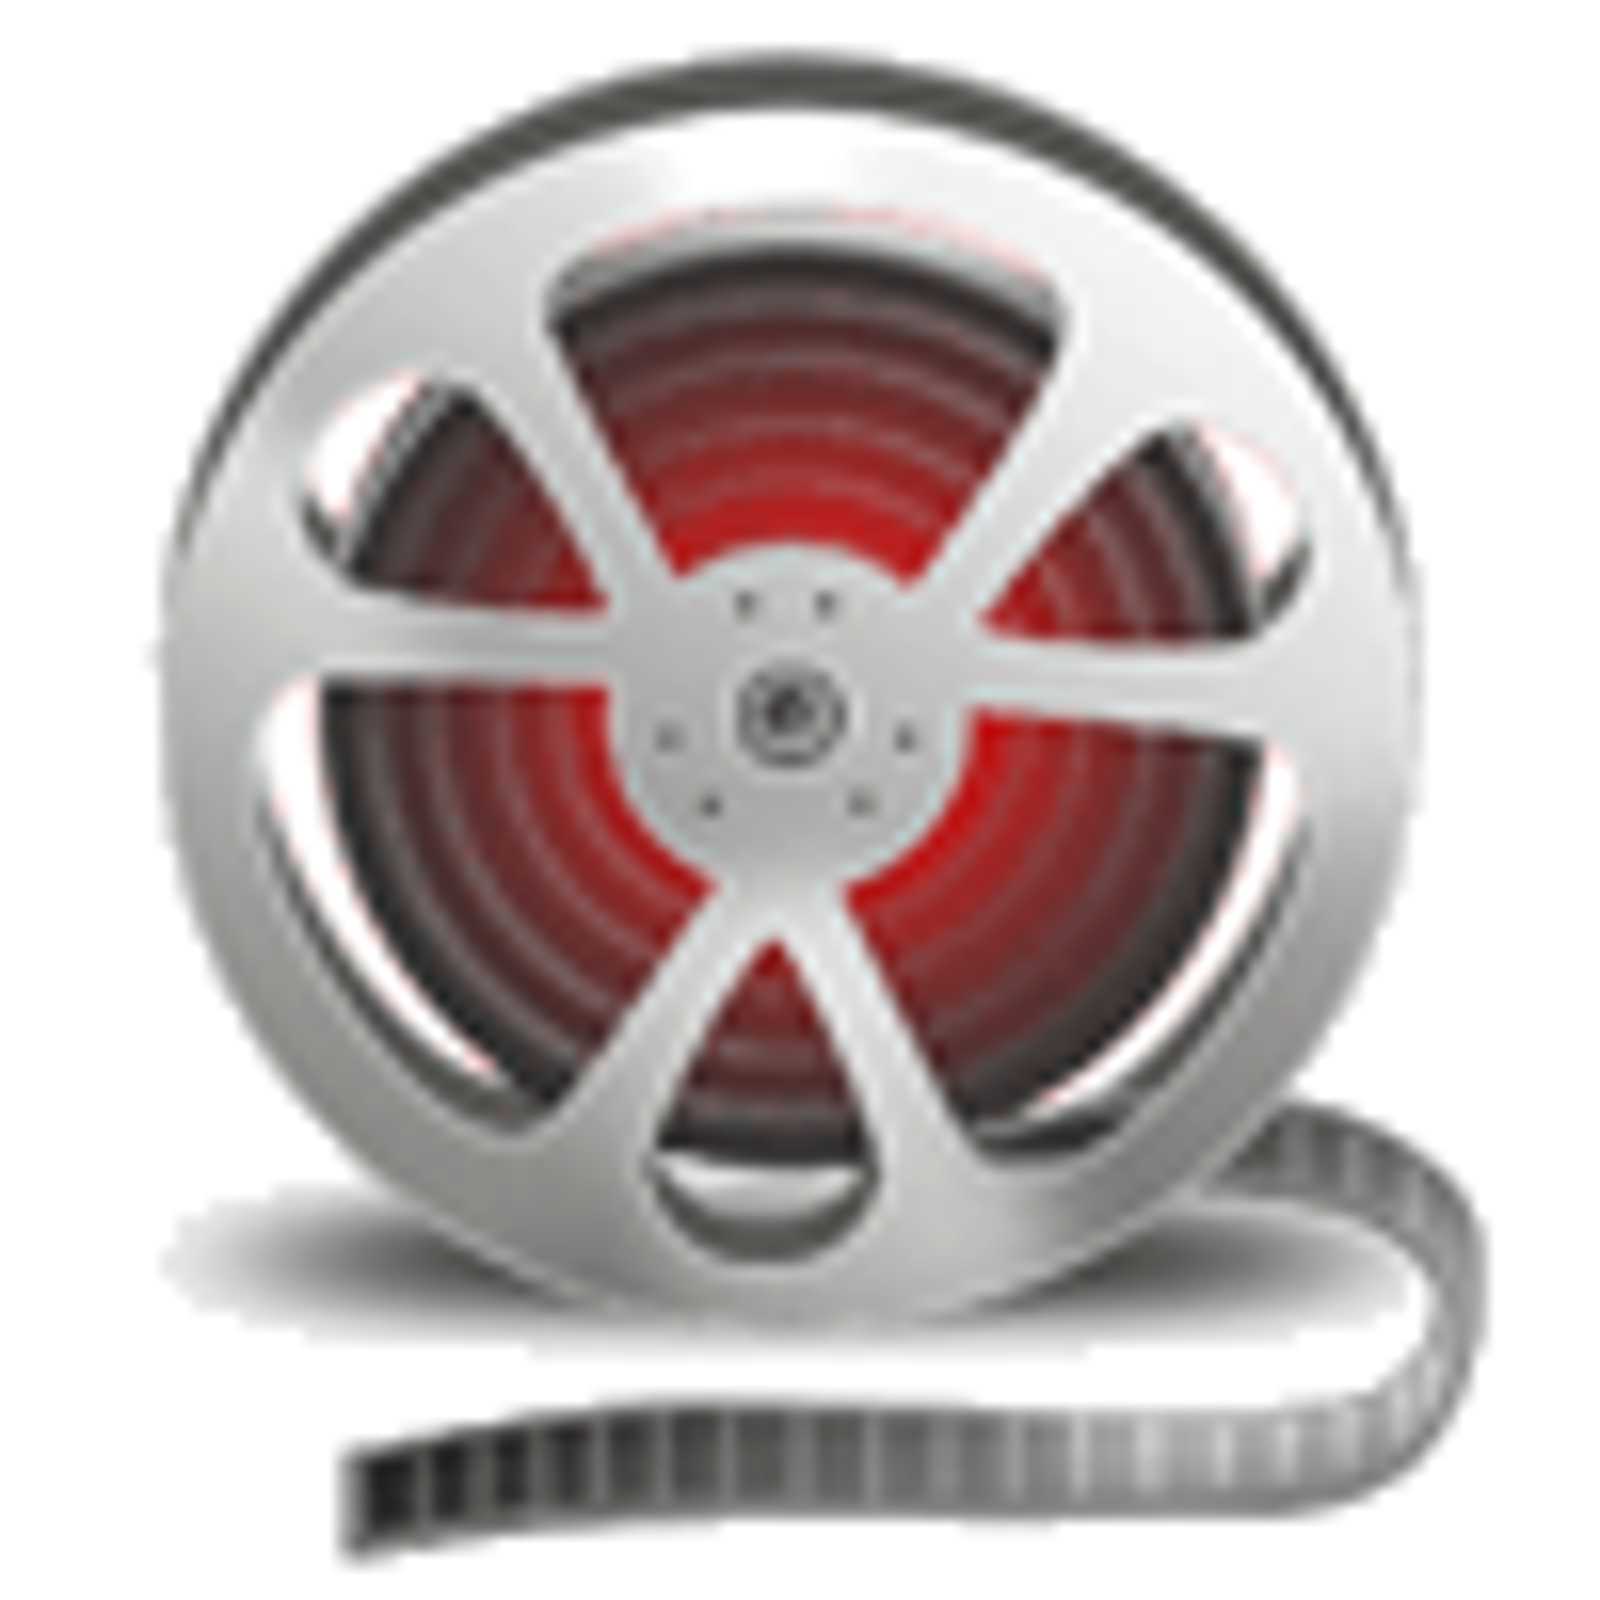 ImTOO 3GP Video Converter 5.1.26.1030